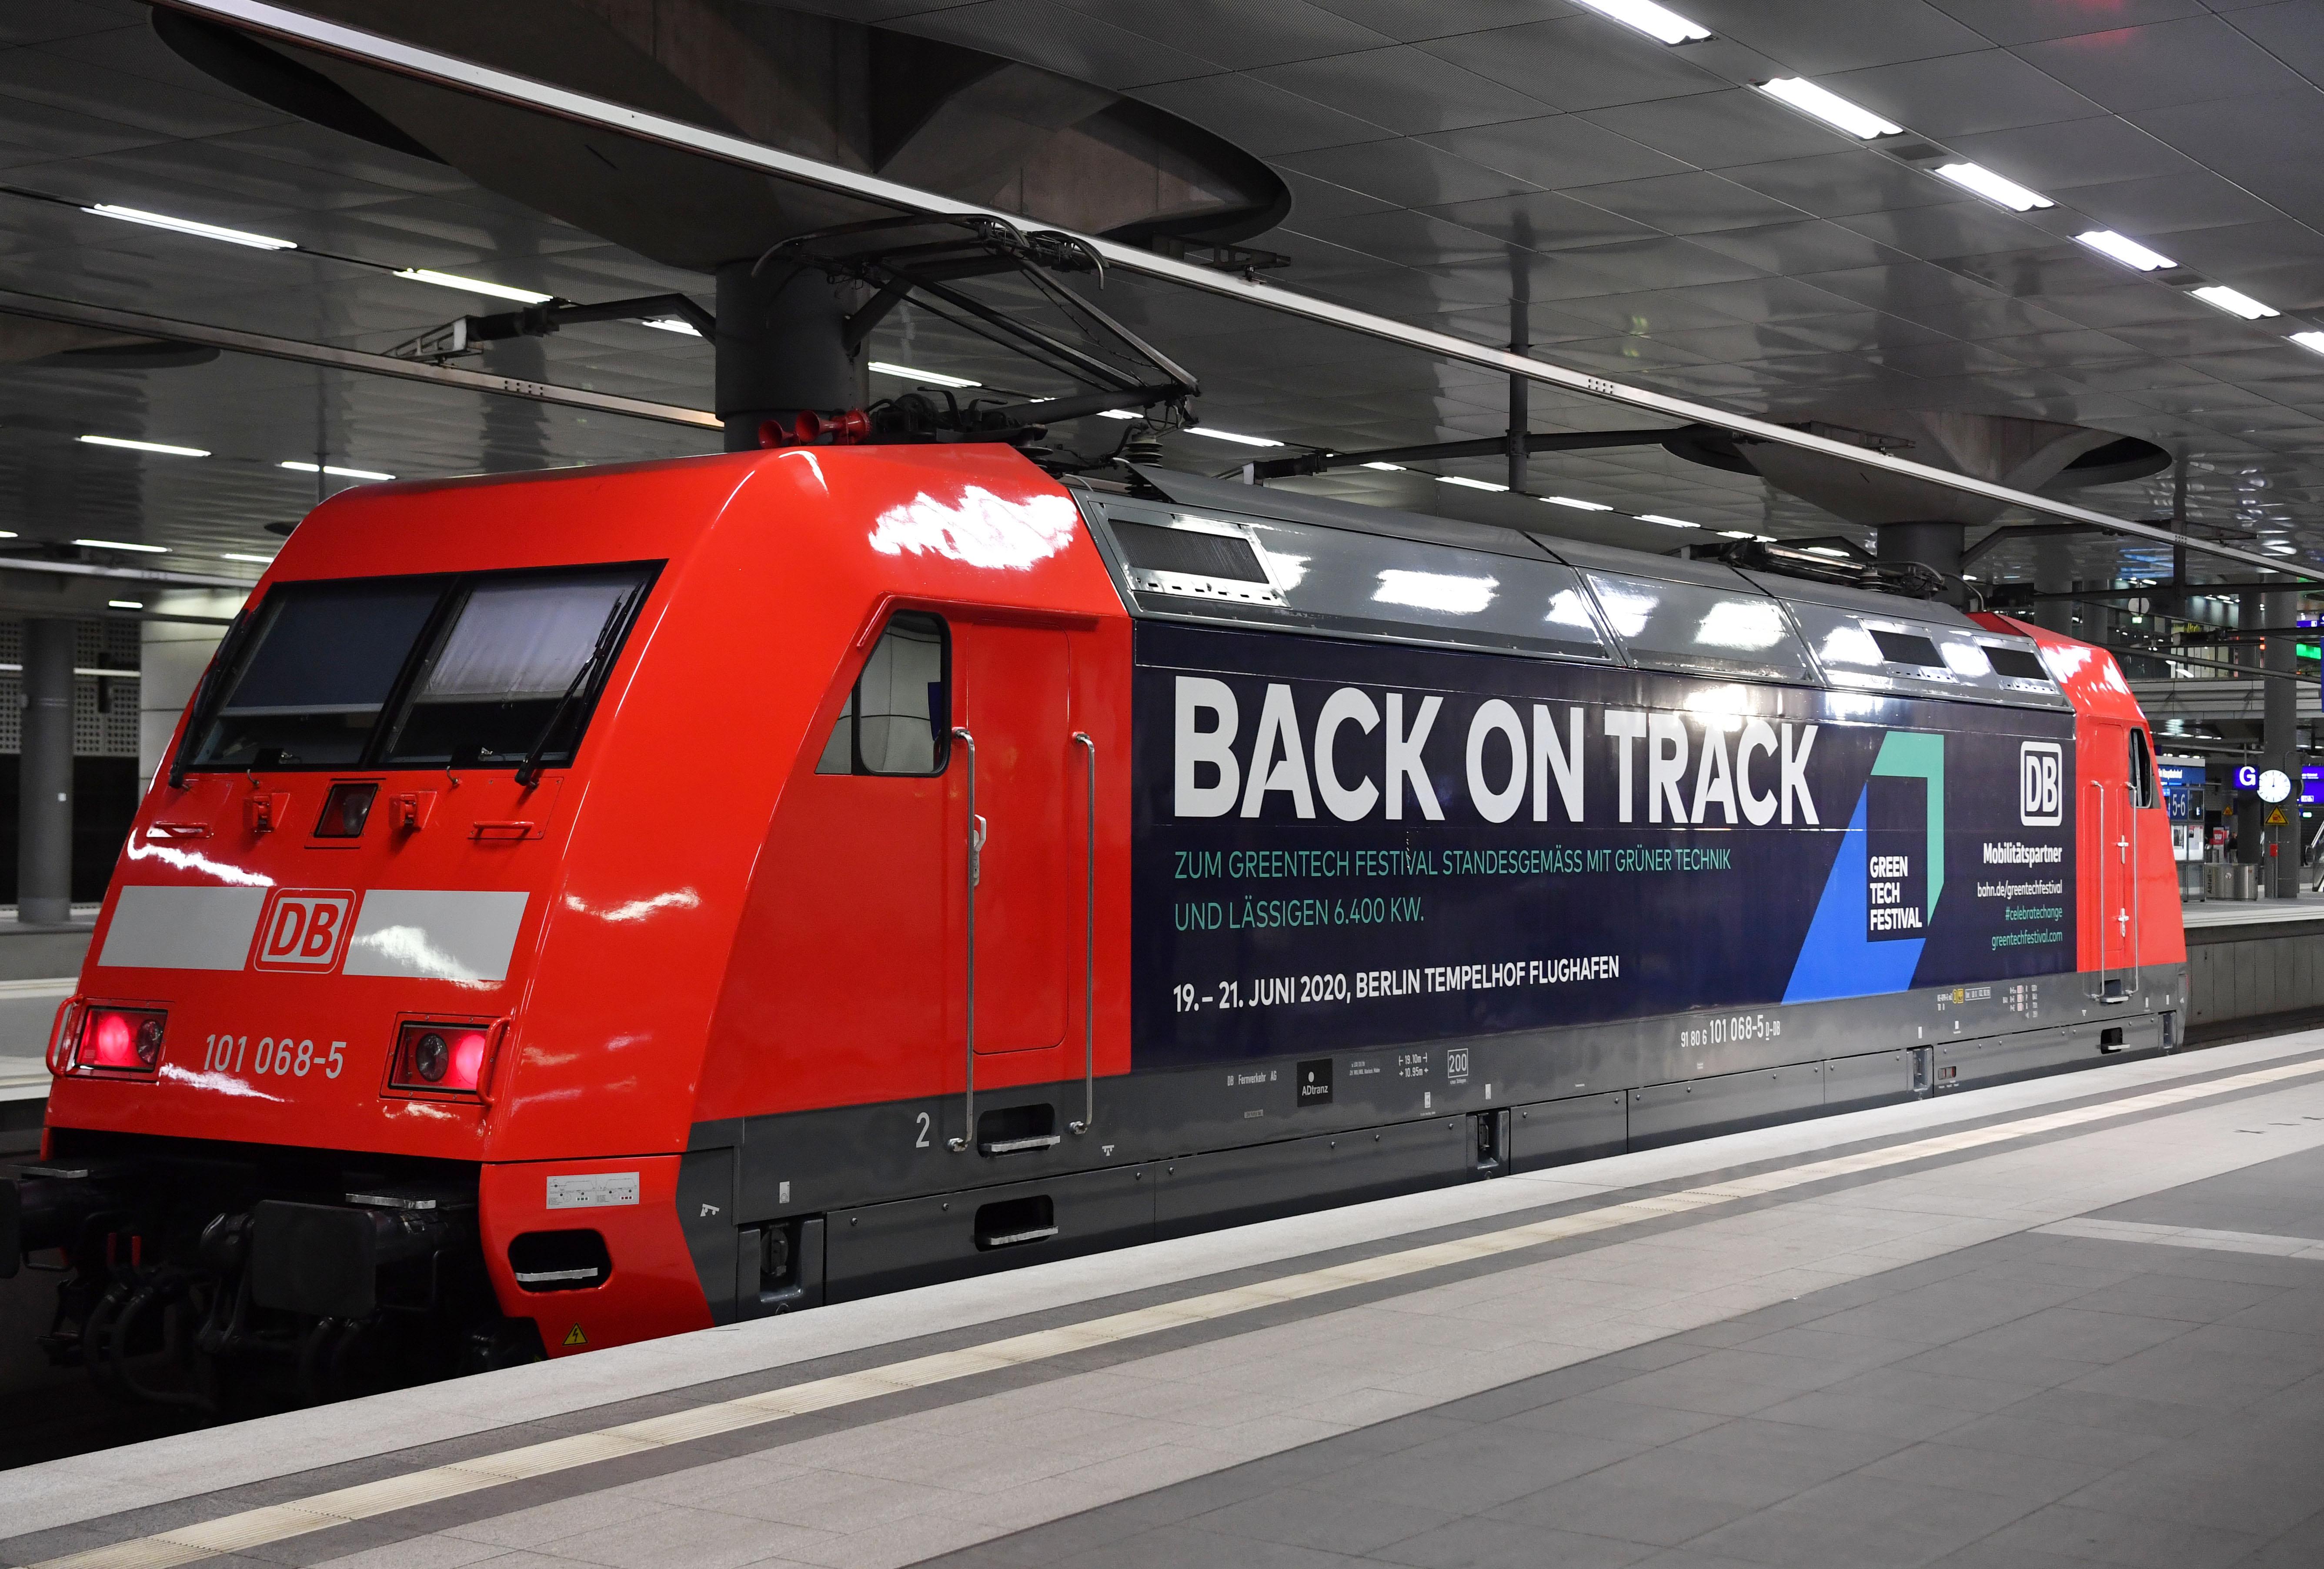 Deutsche Bahn Greentech Festival Locomotive